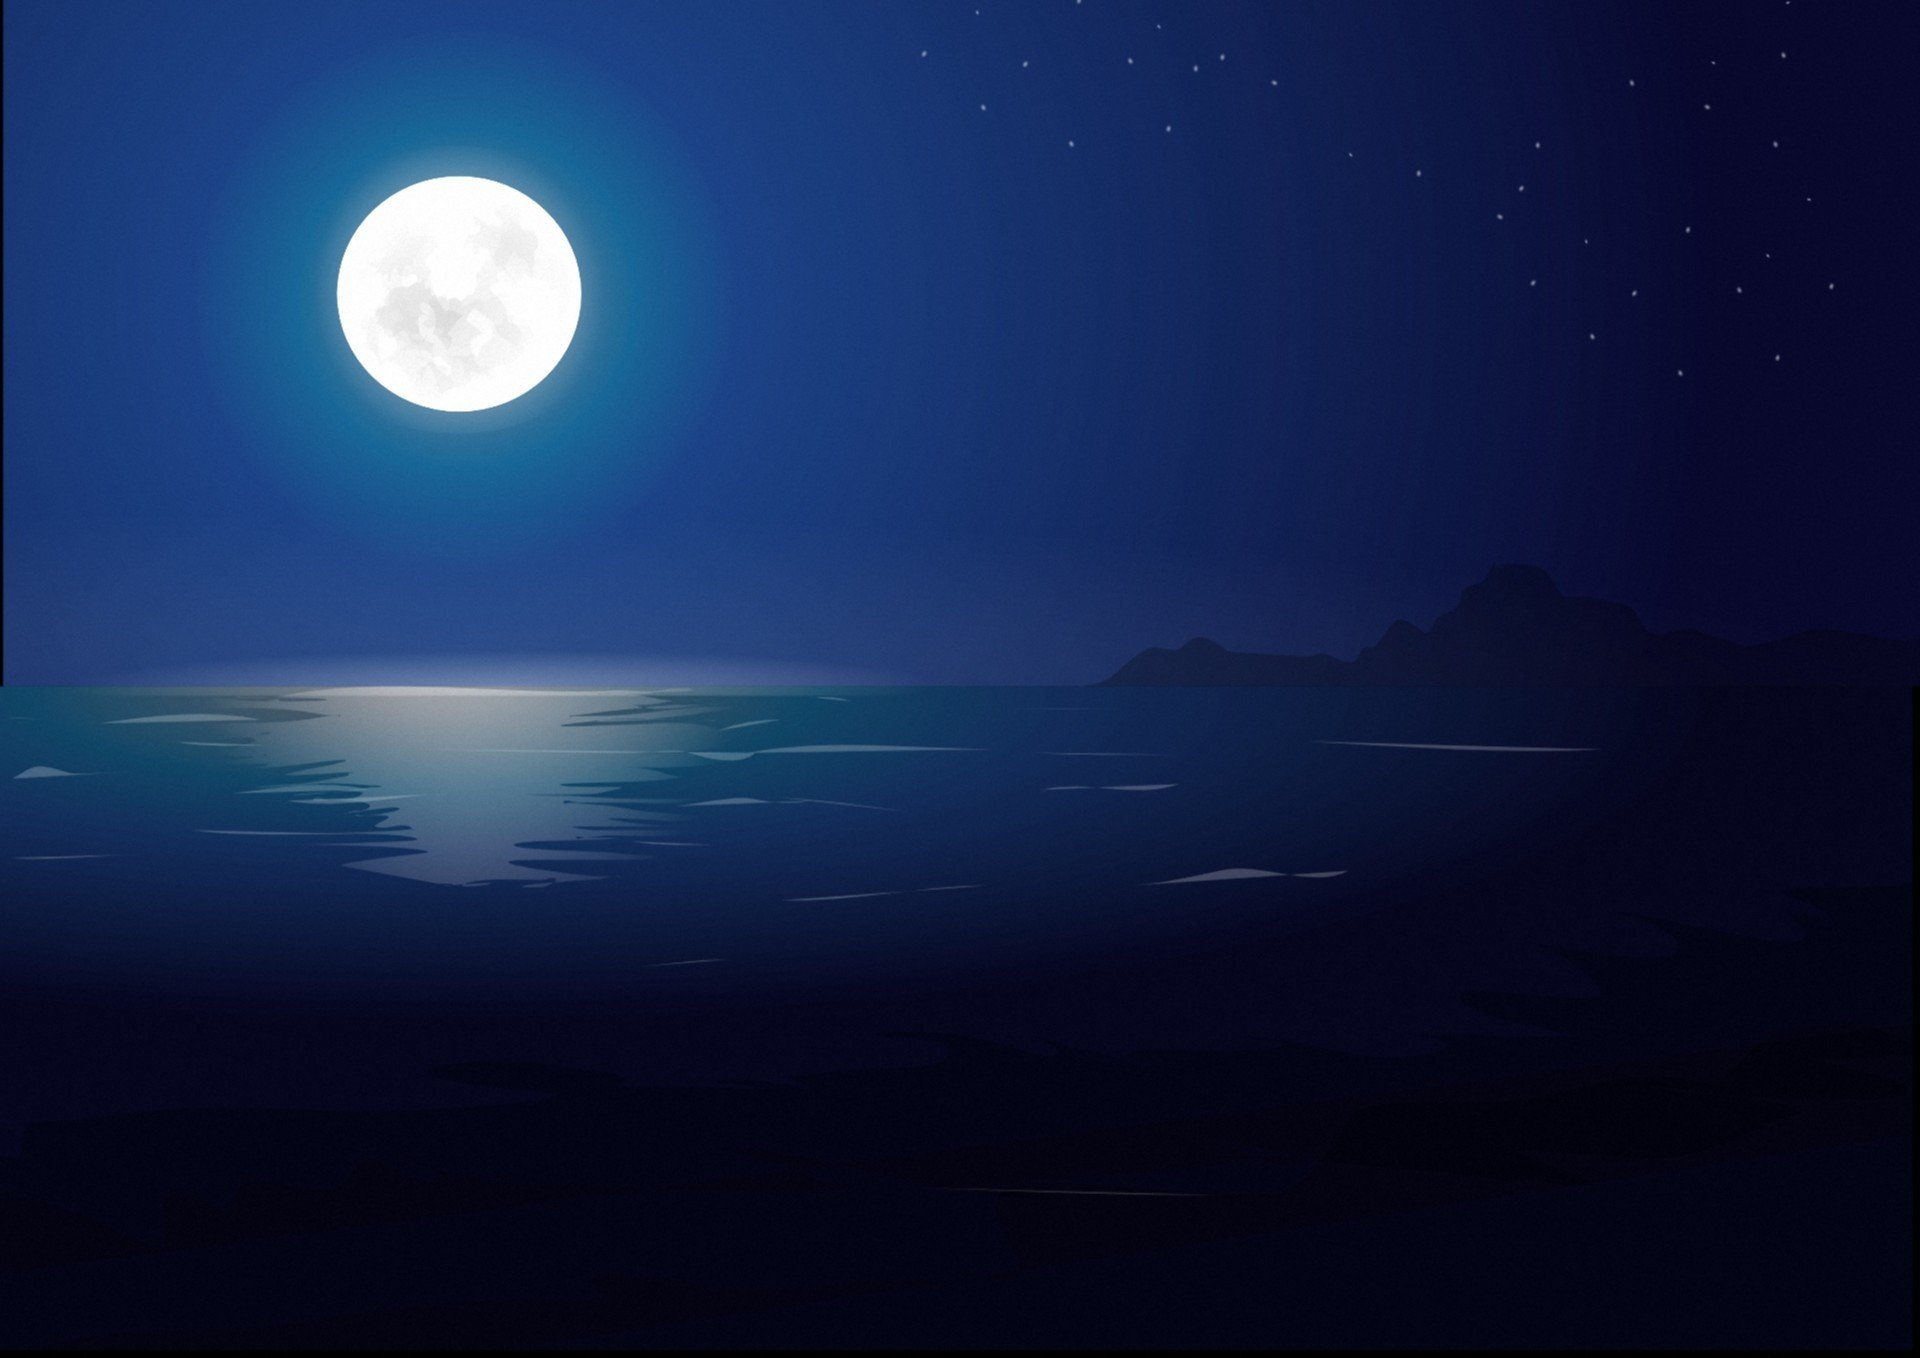 ночь луна море night the moon sea бесплатно